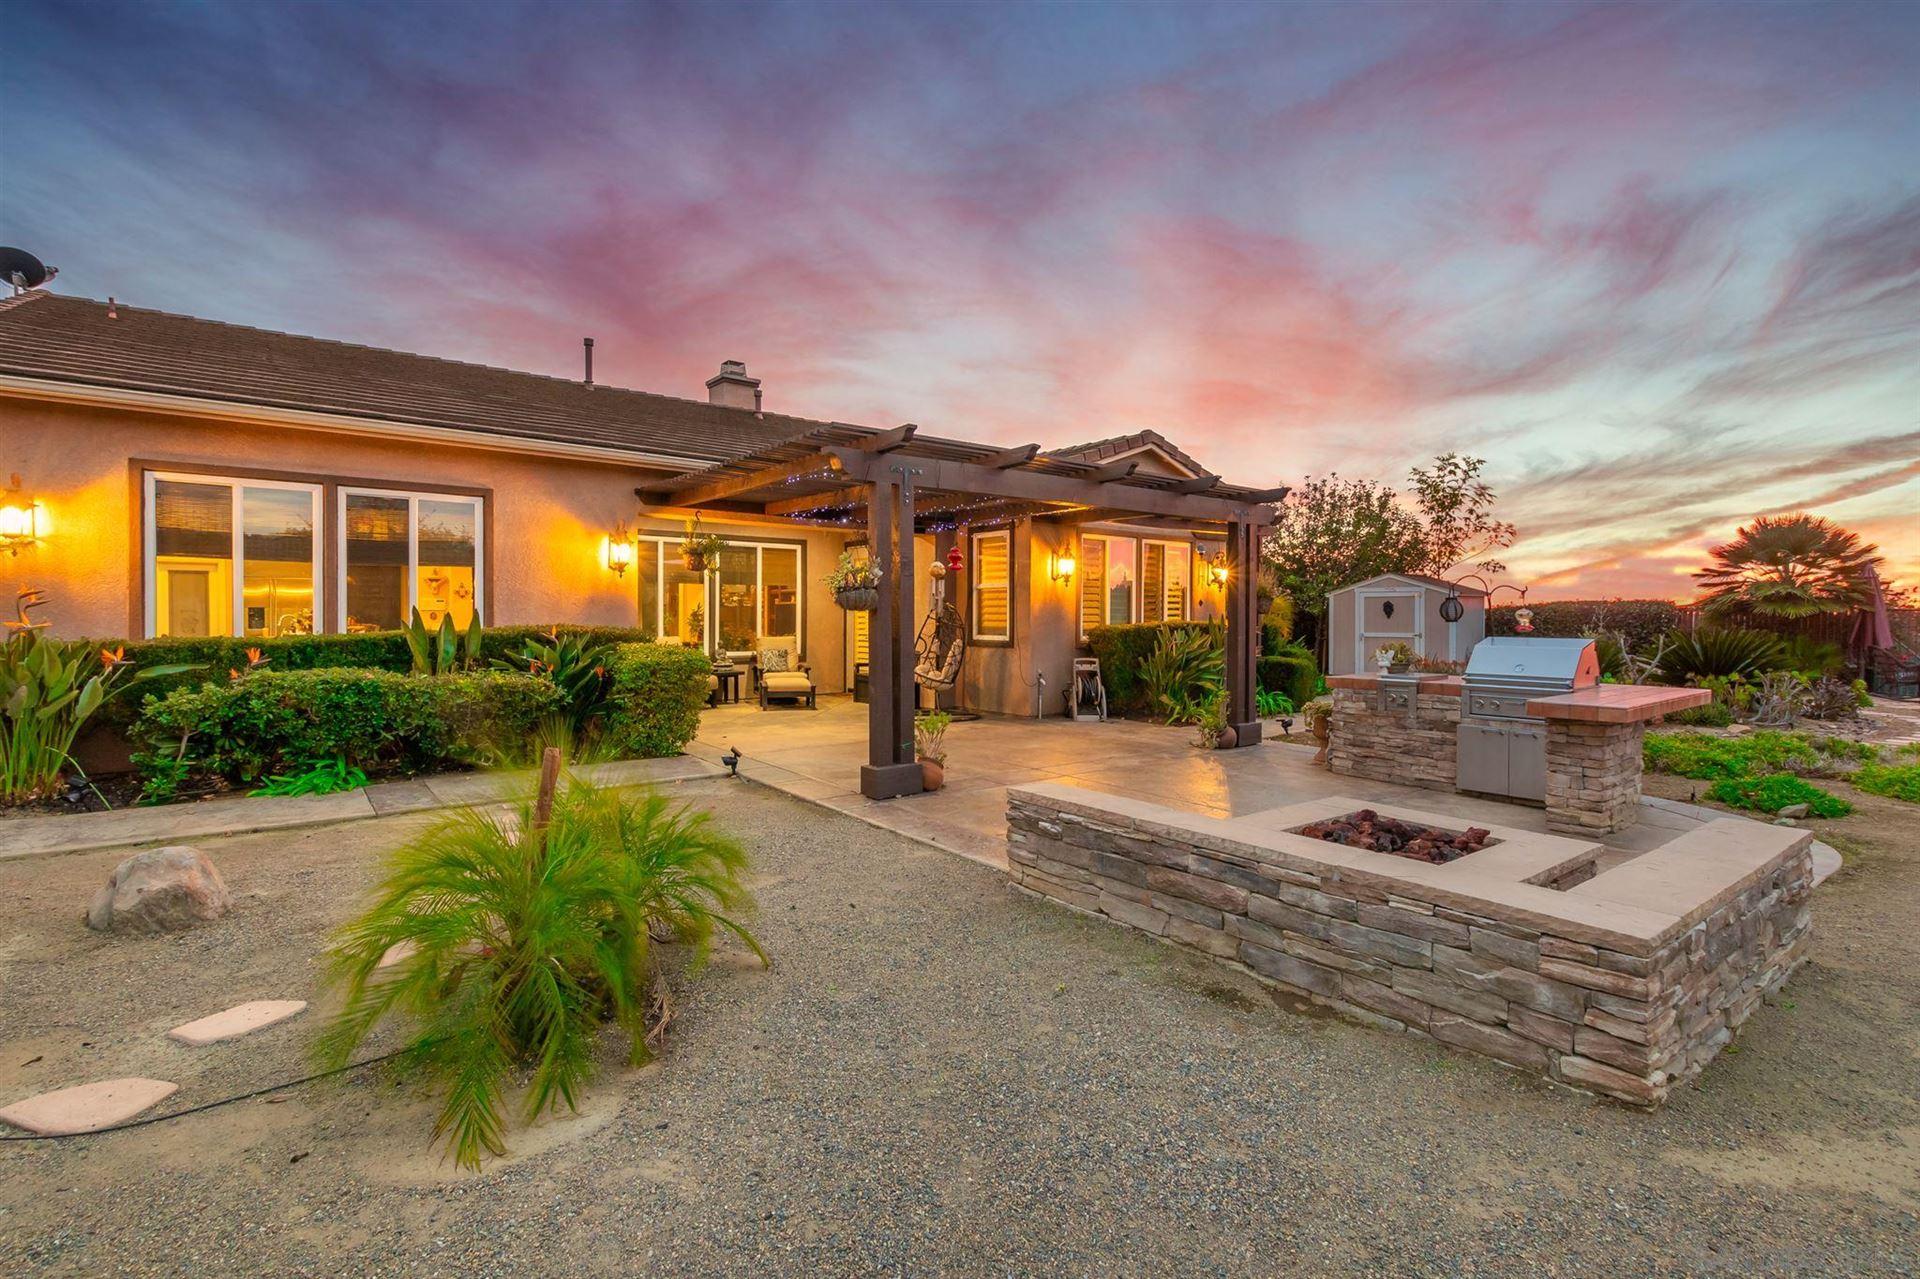 Photo of 636 Ridgemont Cir, Escondido, CA 92027 (MLS # 210000910)